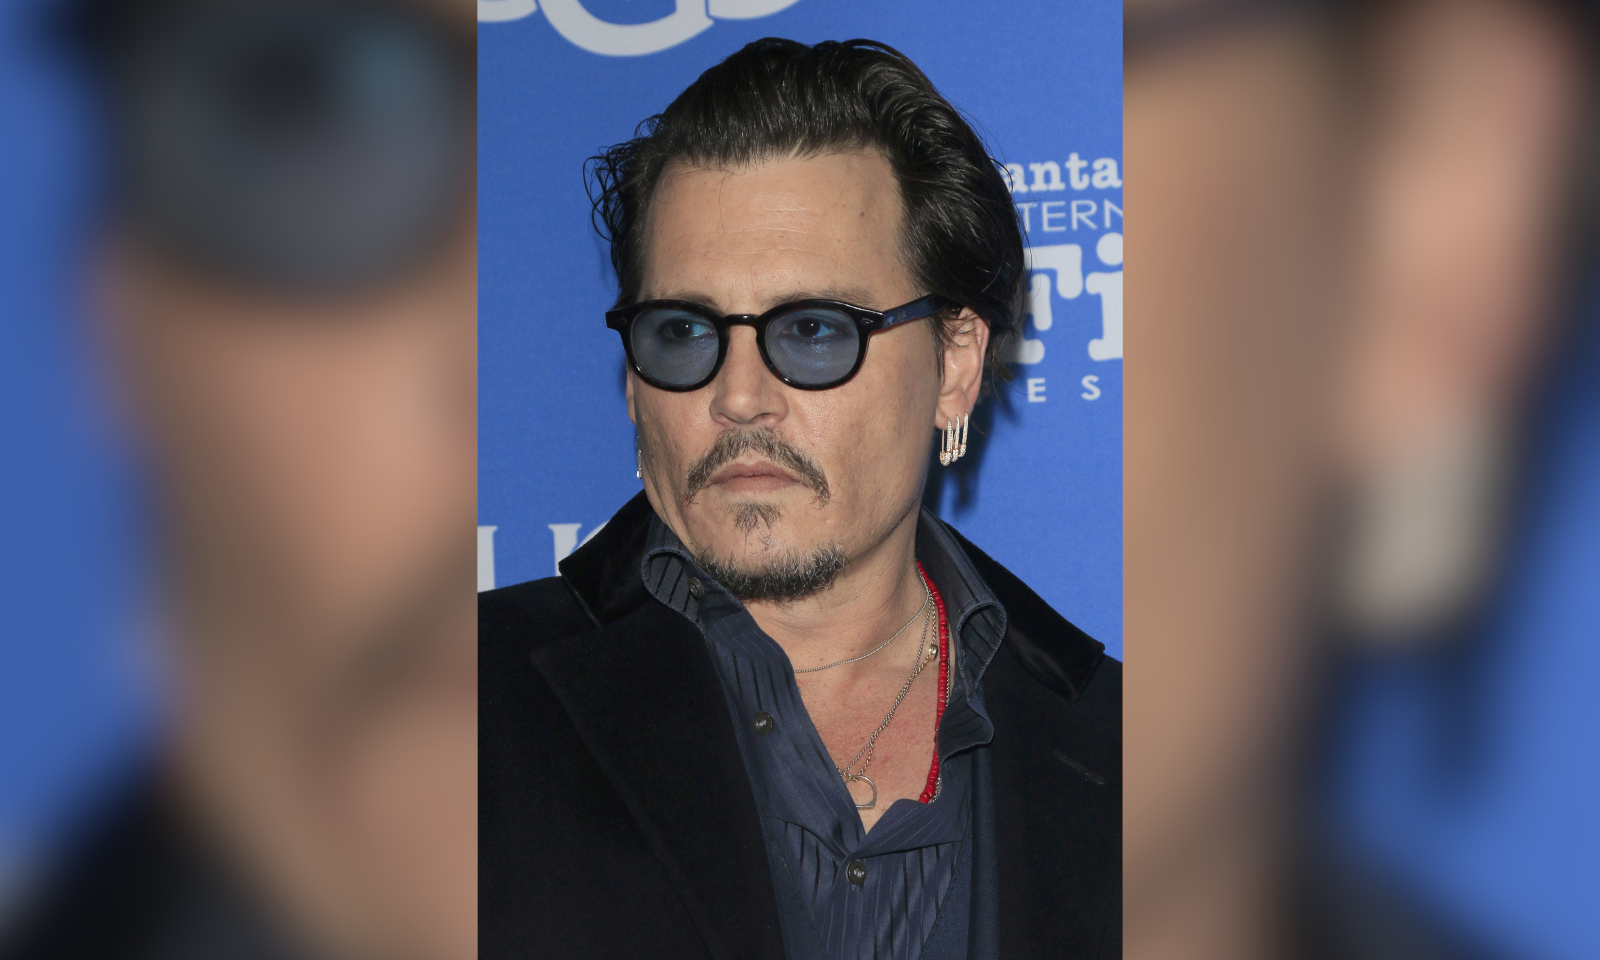 Johnny Depp: Alleged Assault Victim Wants $70k In Damages